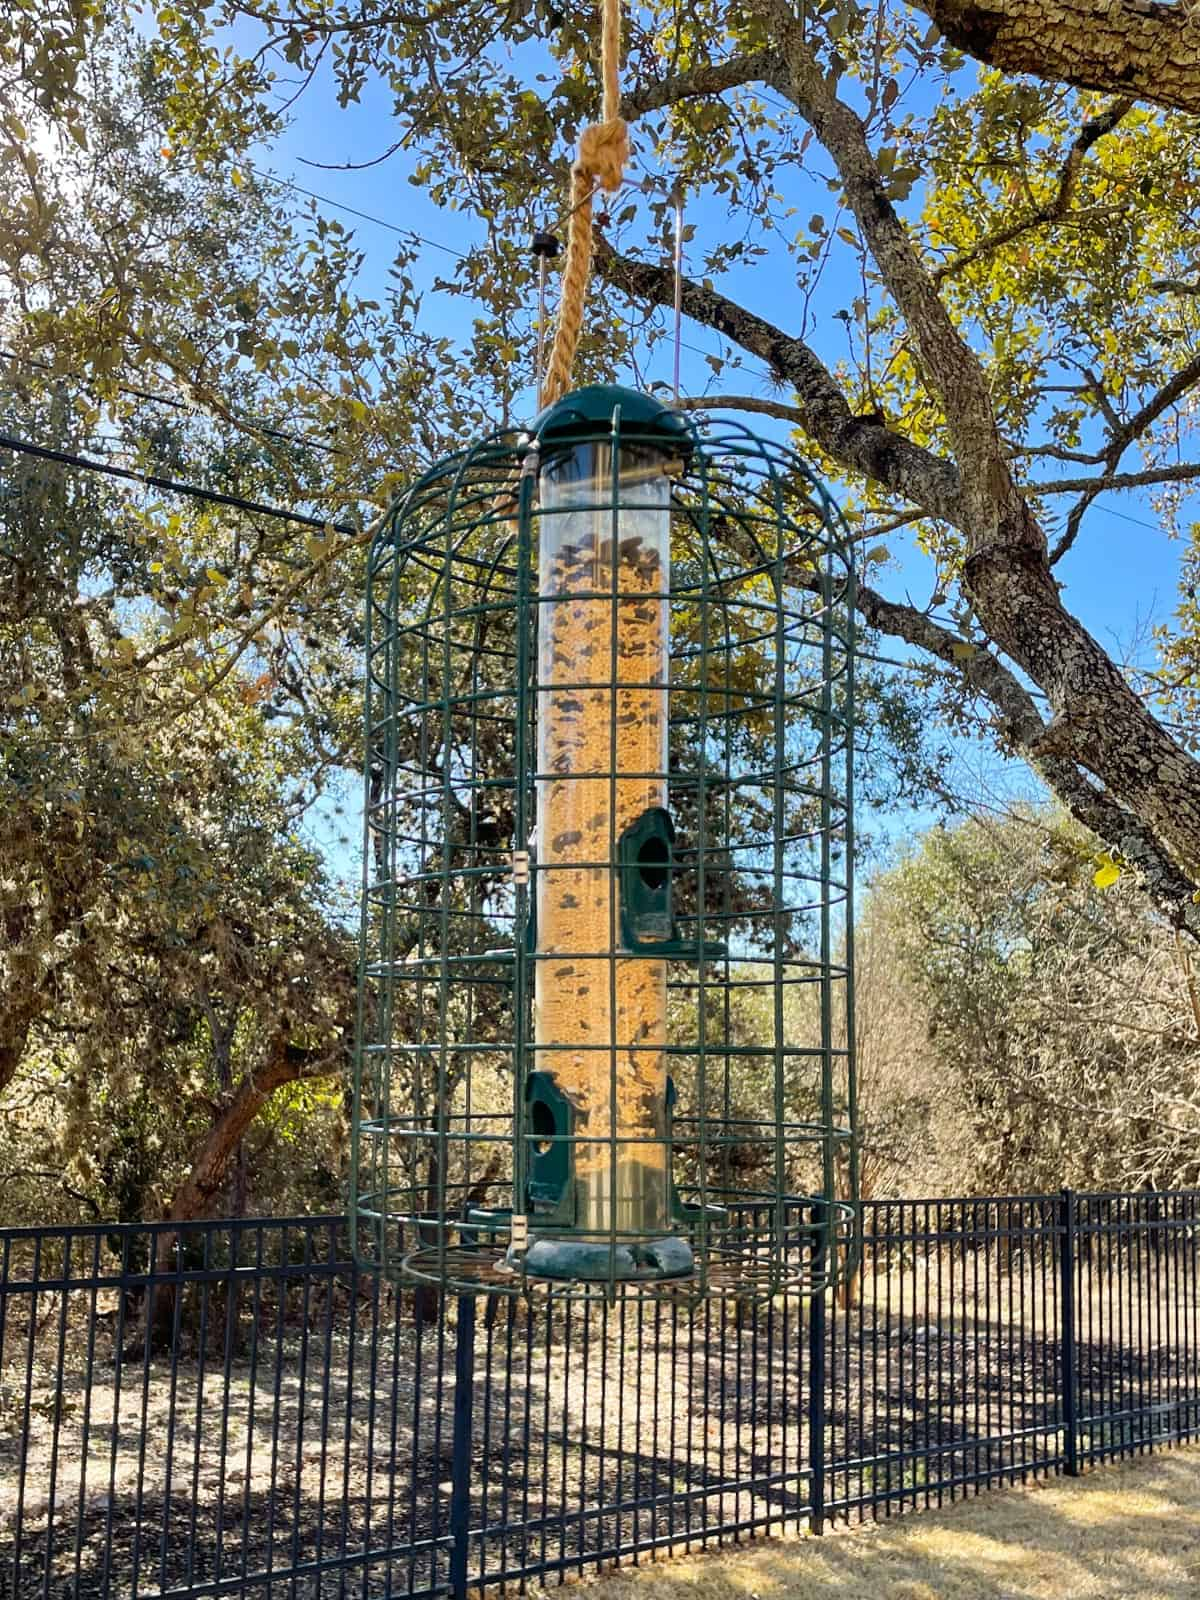 Bird feeder for a Certified Wildlife Habitat